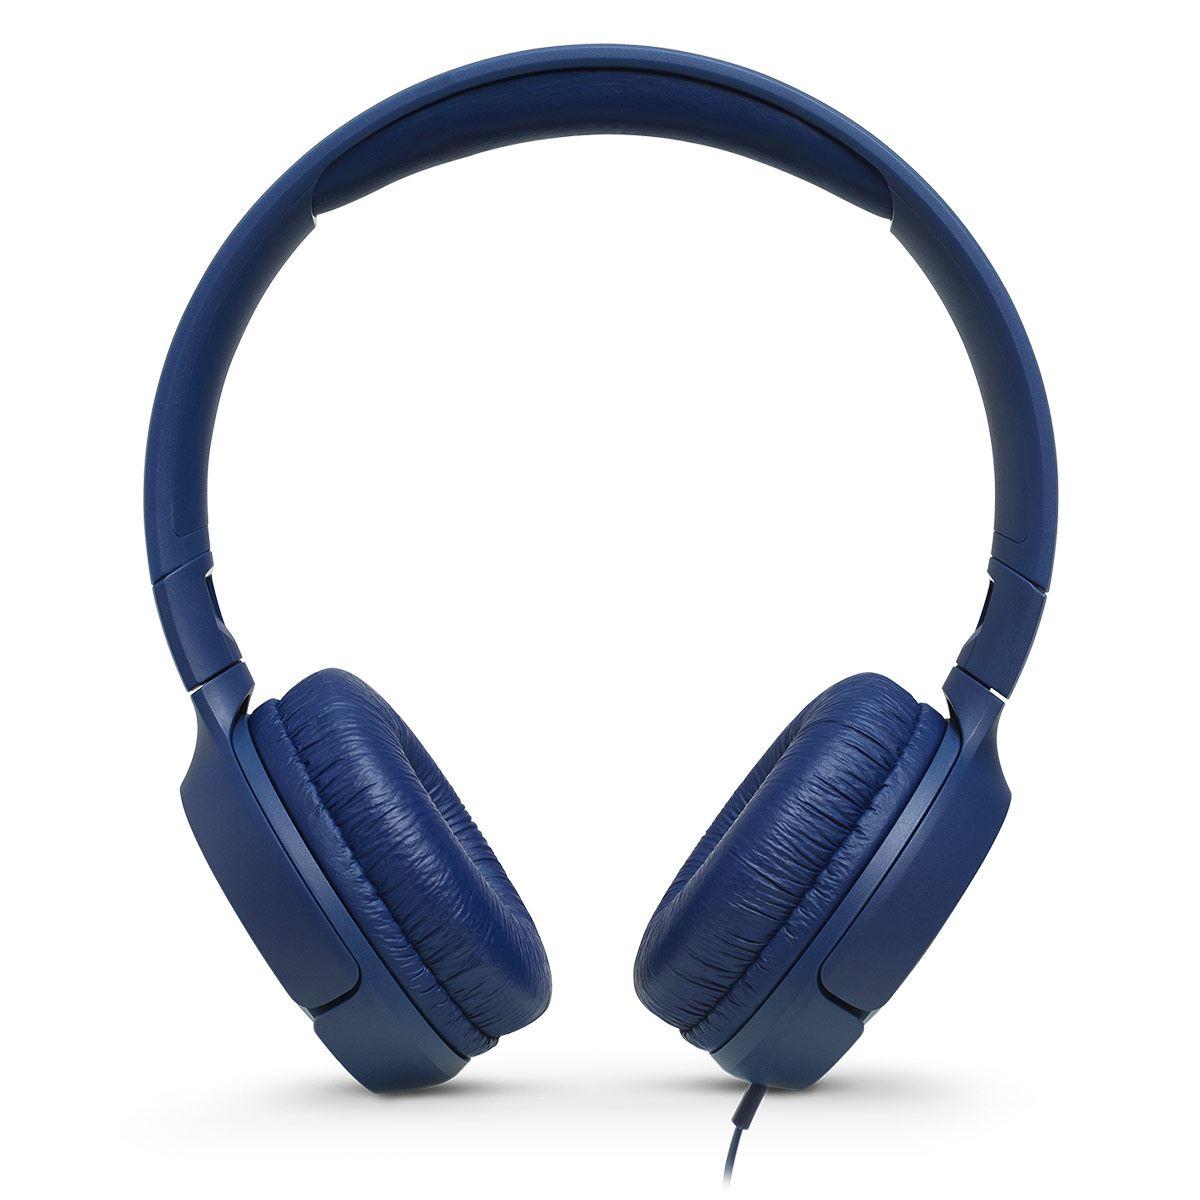 Audífonos Tune 500 Azul JBL